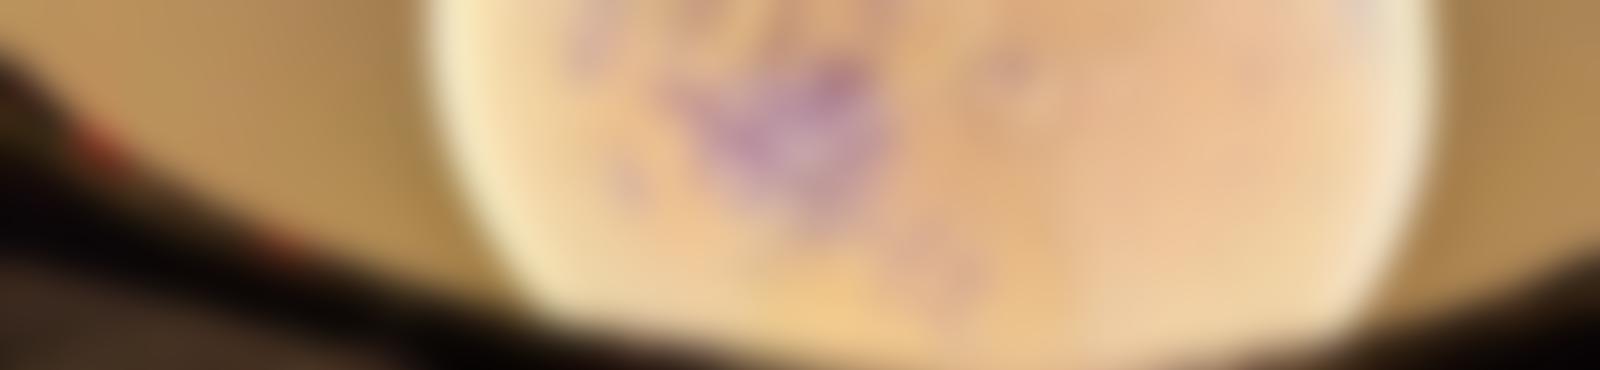 Blurred fcce81a3 16b2 4d8b 8de4 7360dc8fd65e